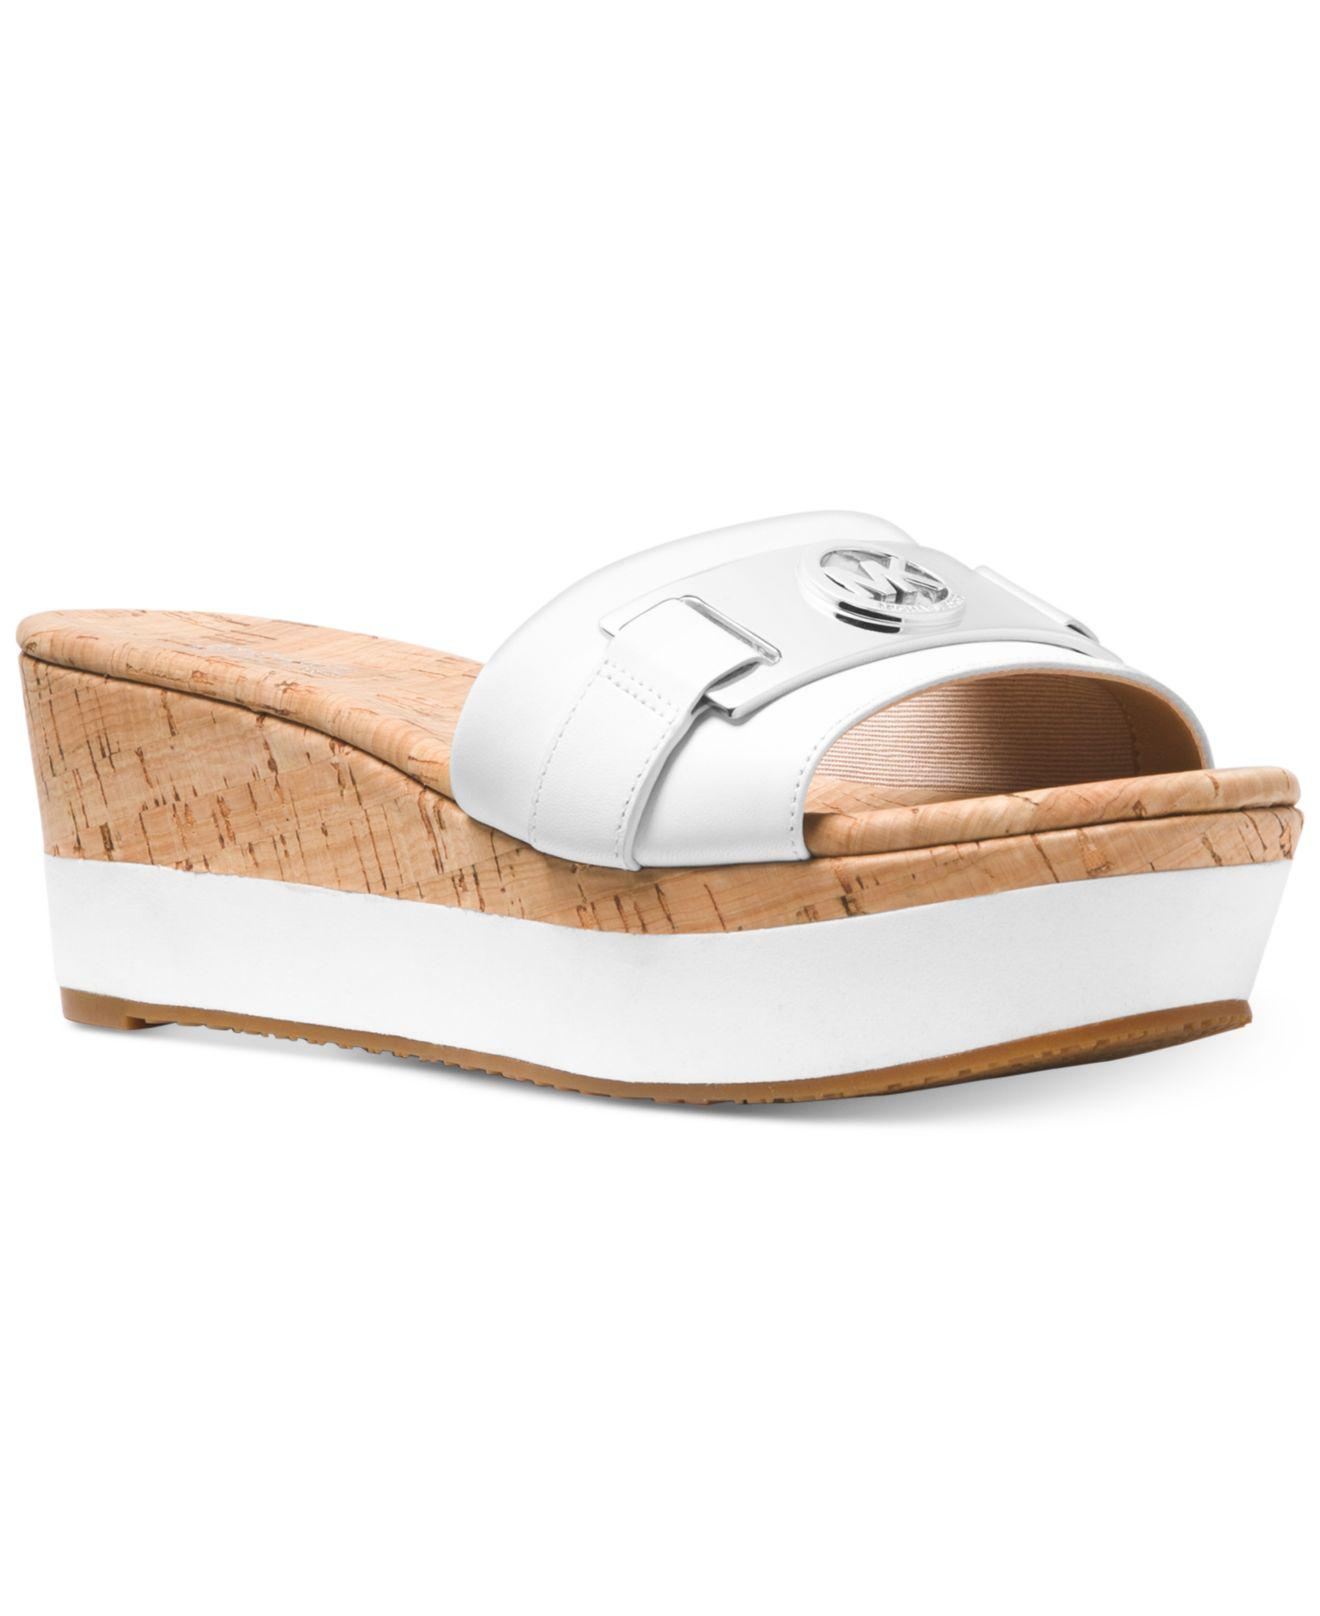 ea6f187b81e Michael Kors Michael Warren Platform Wedge Sandals in White - Save 4 ...